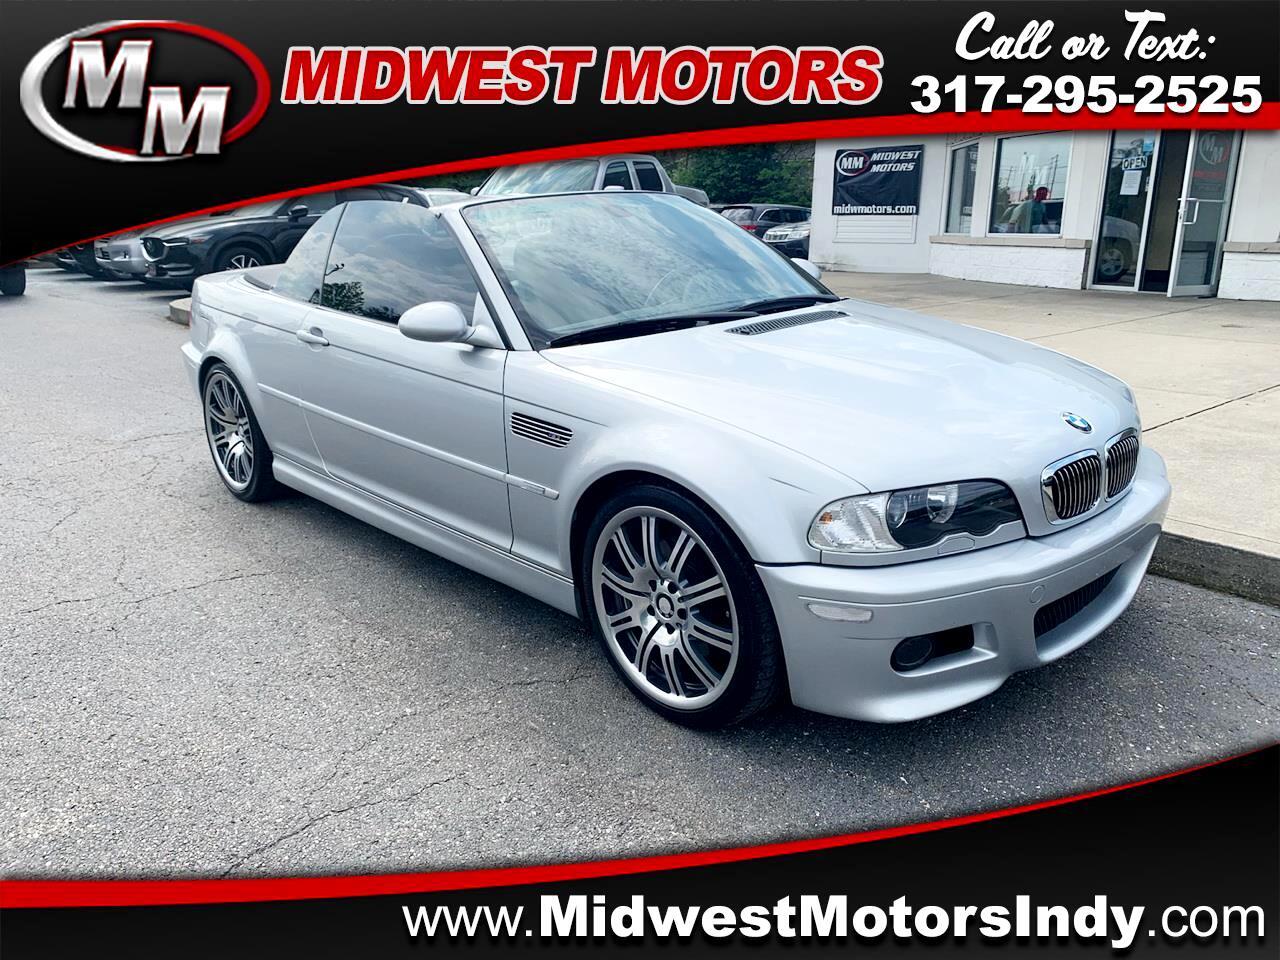 BMW M3 Convertible 2006